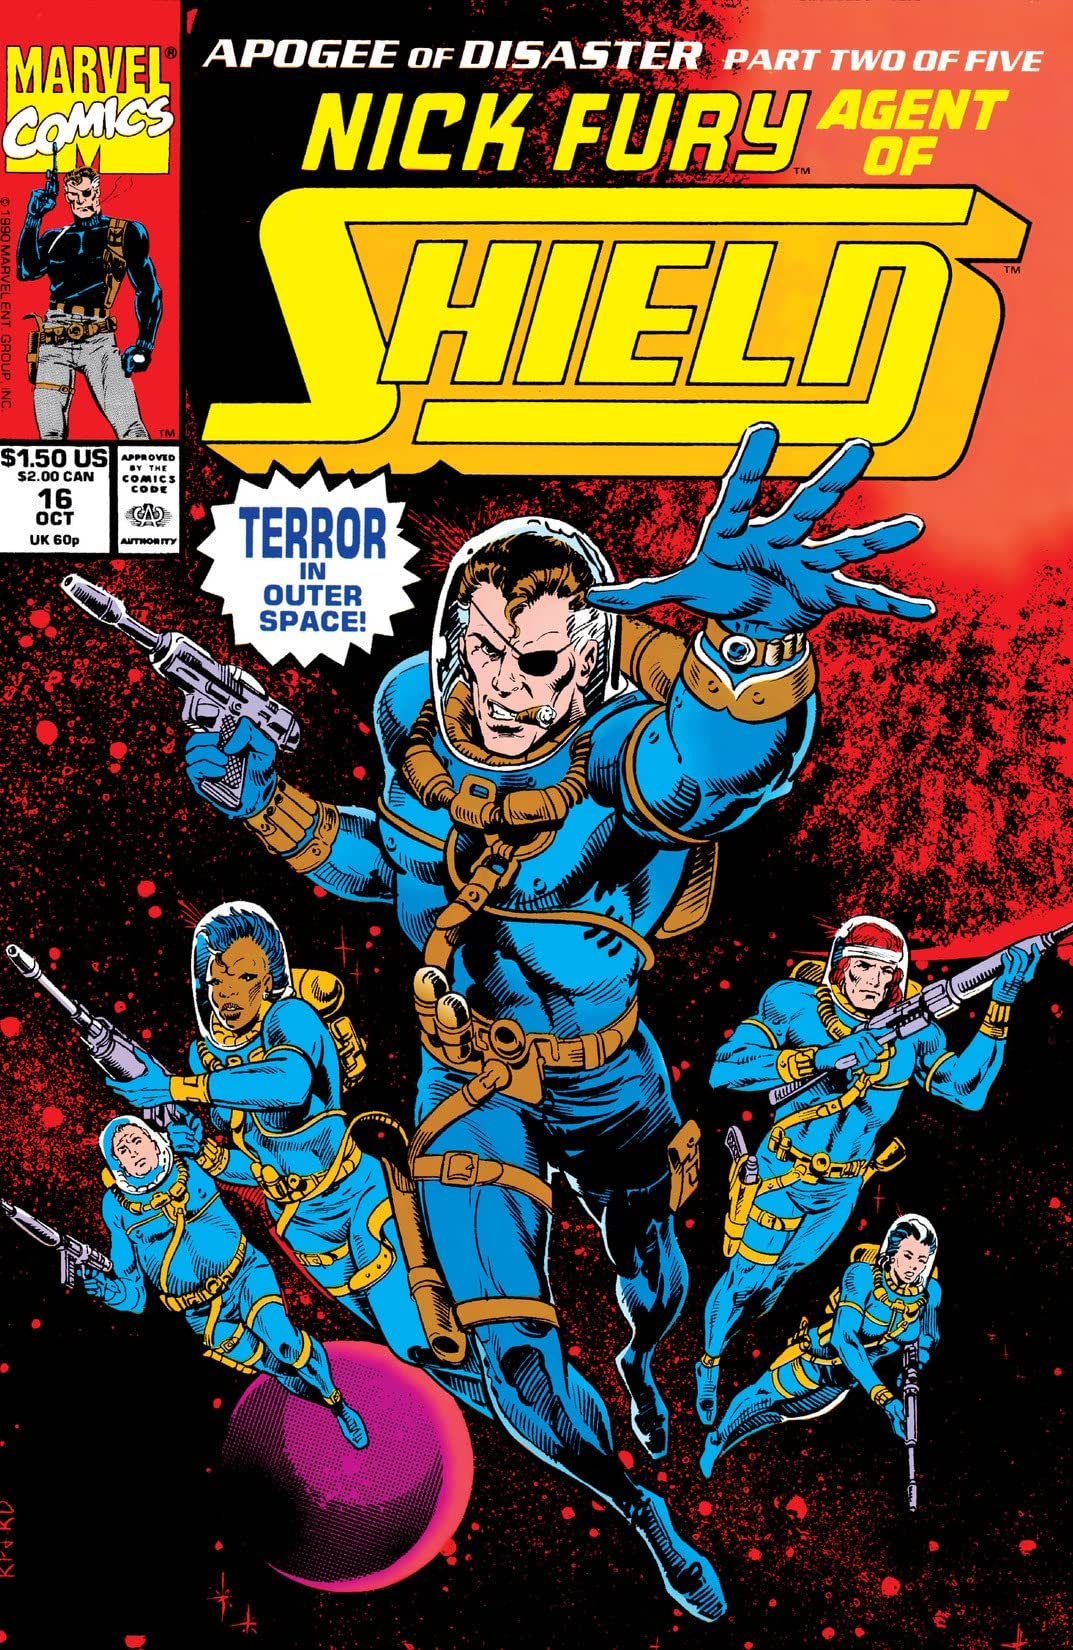 Nick Fury, Agent of S.H.I.E.L.D. (1989-1992) #16